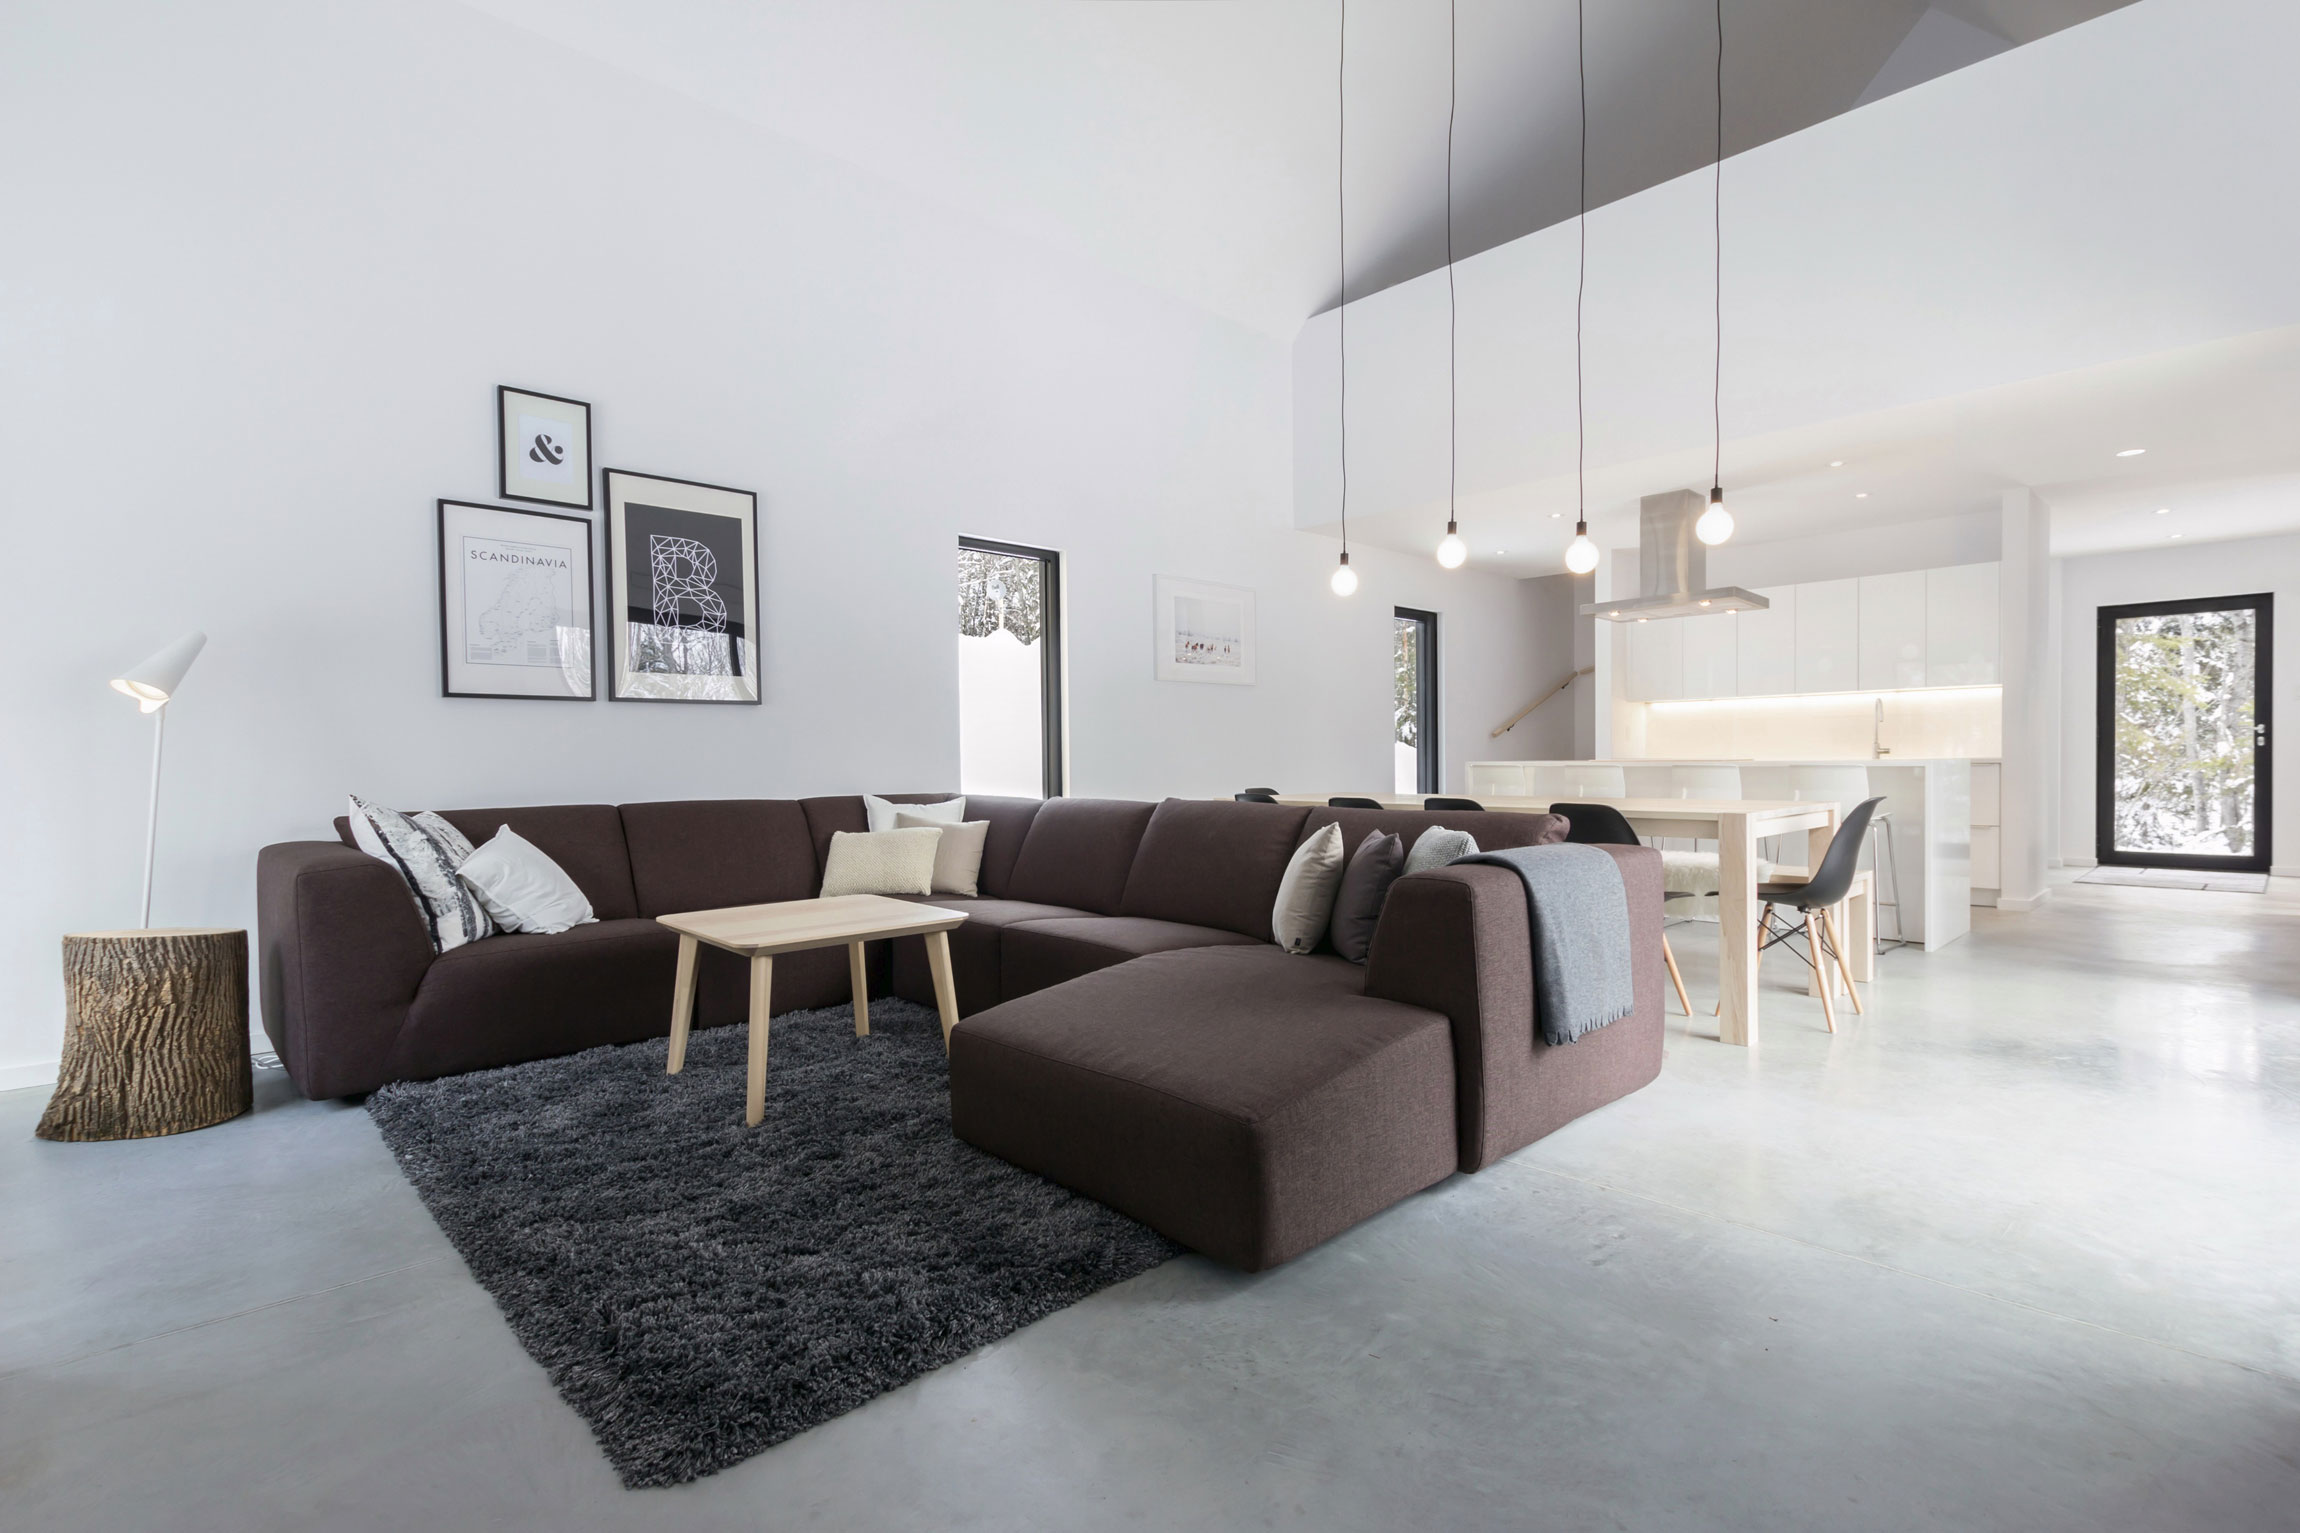 Cargo Architecture Designs a Cozy Cabin in Charlevoix